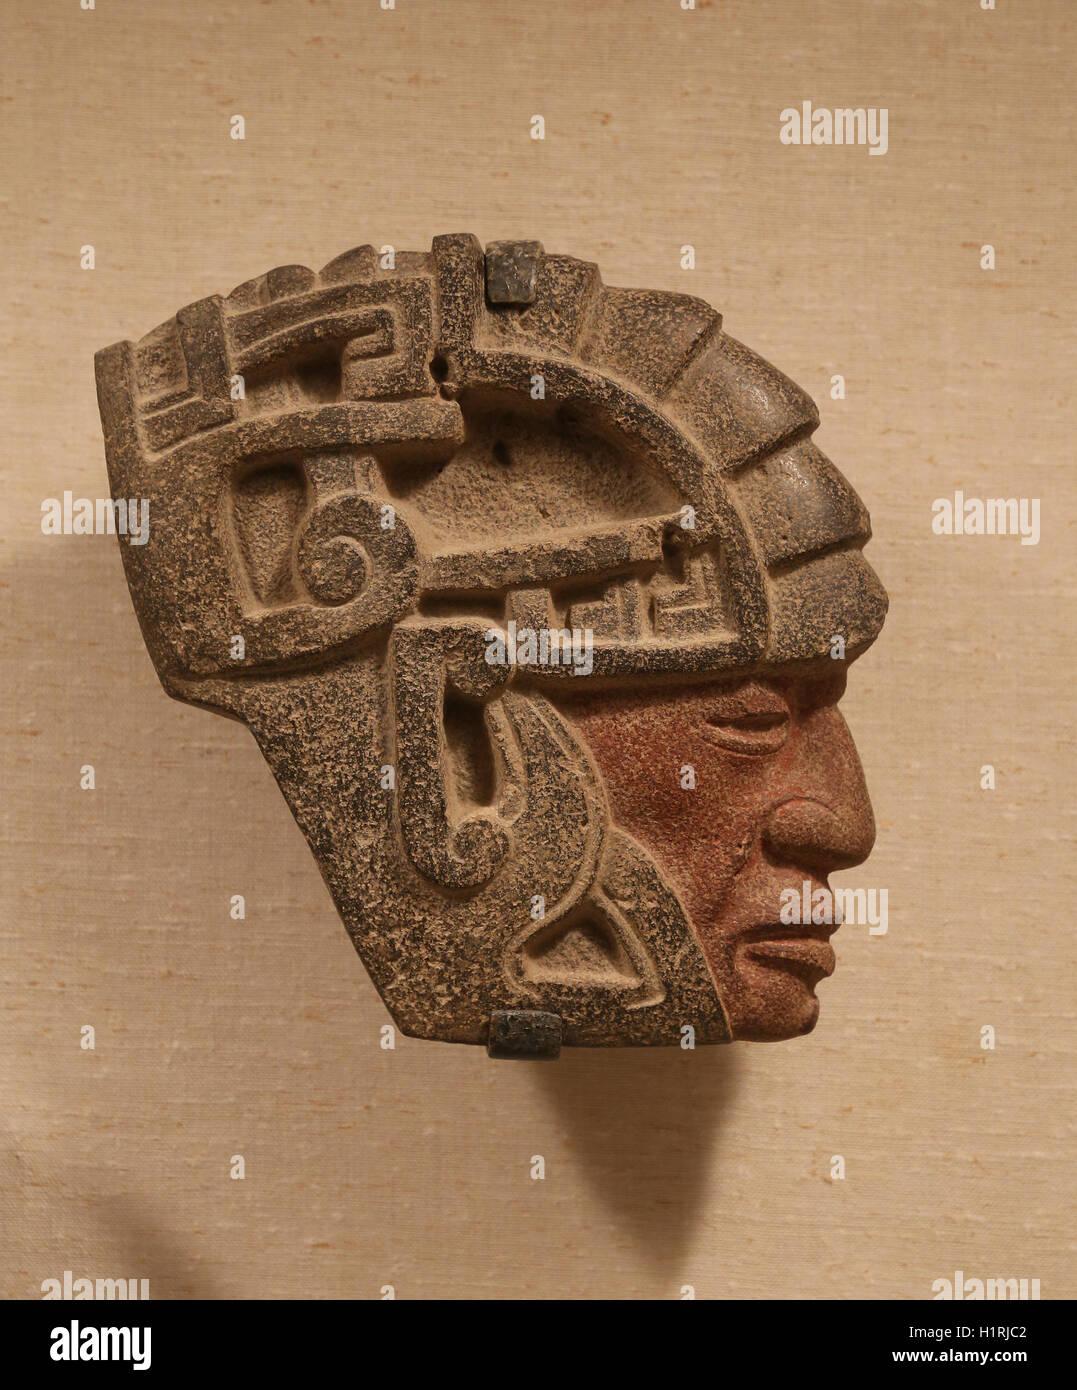 America. Mexico. Veracruz. Warrior head Hacha. 6th-8th century. Stone, pigment. Mexico. - Stock Image